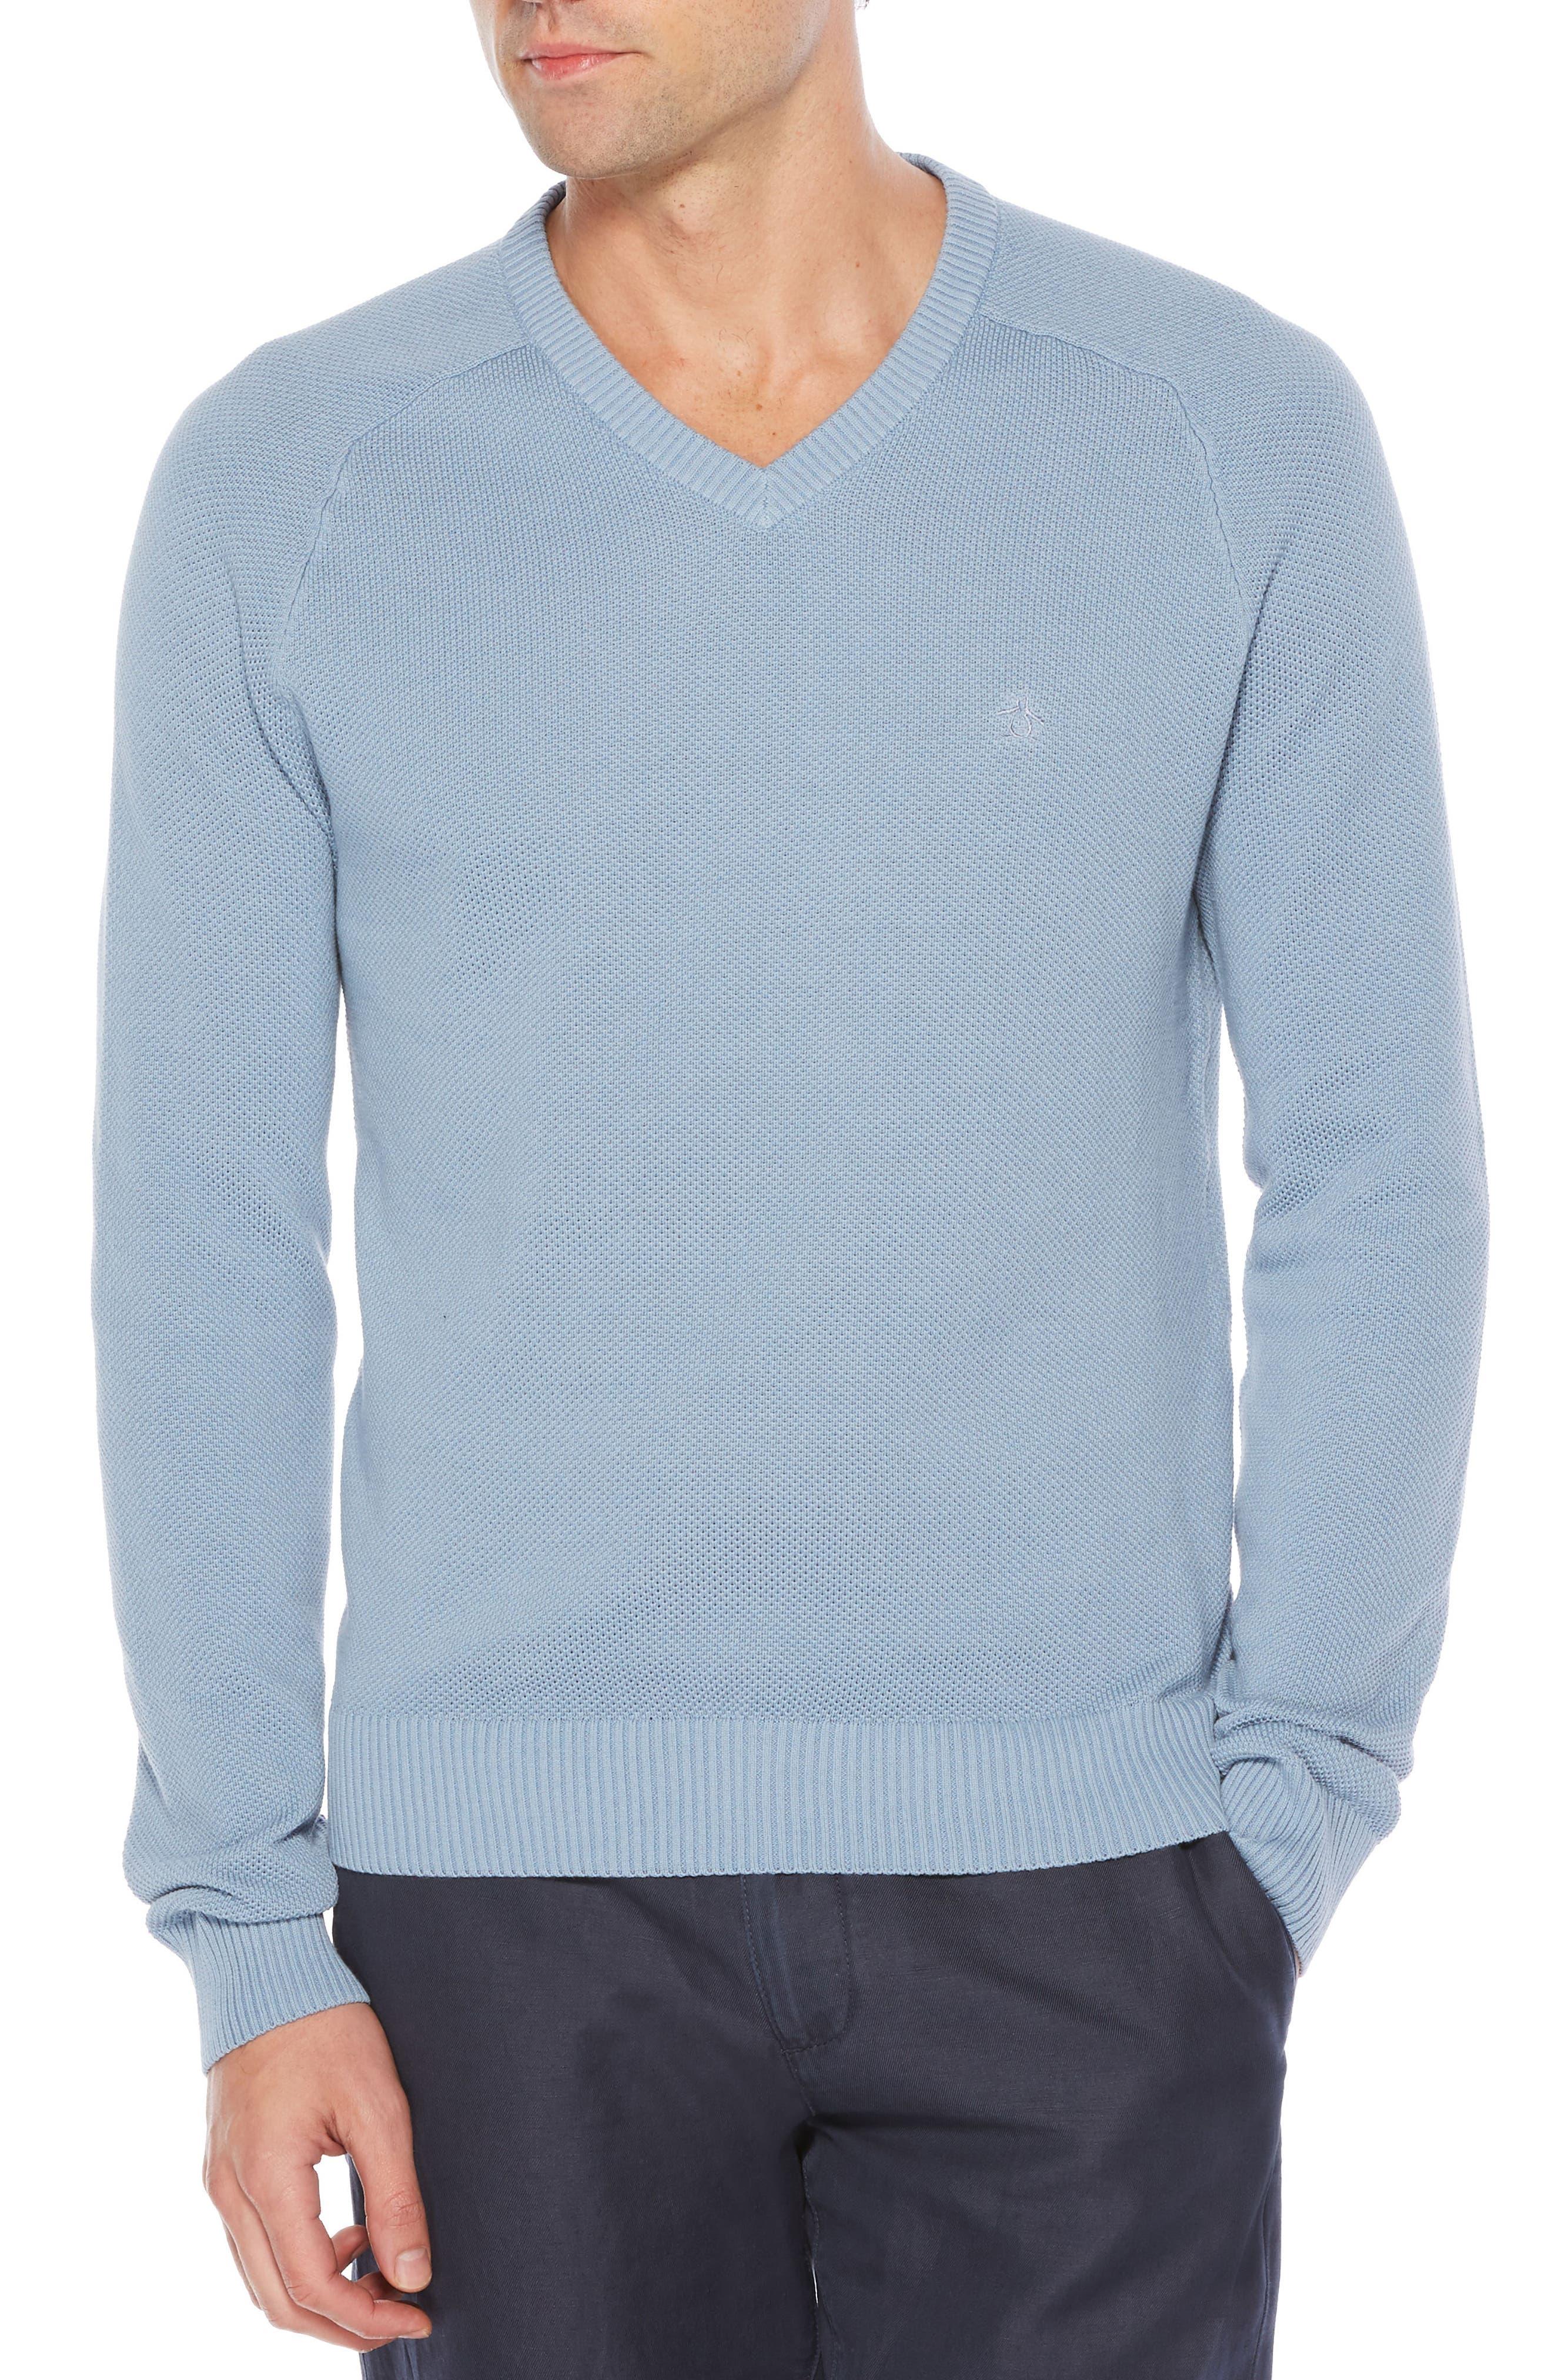 Original Penguin Piqué V-Neck Sweater (Big & Tall)